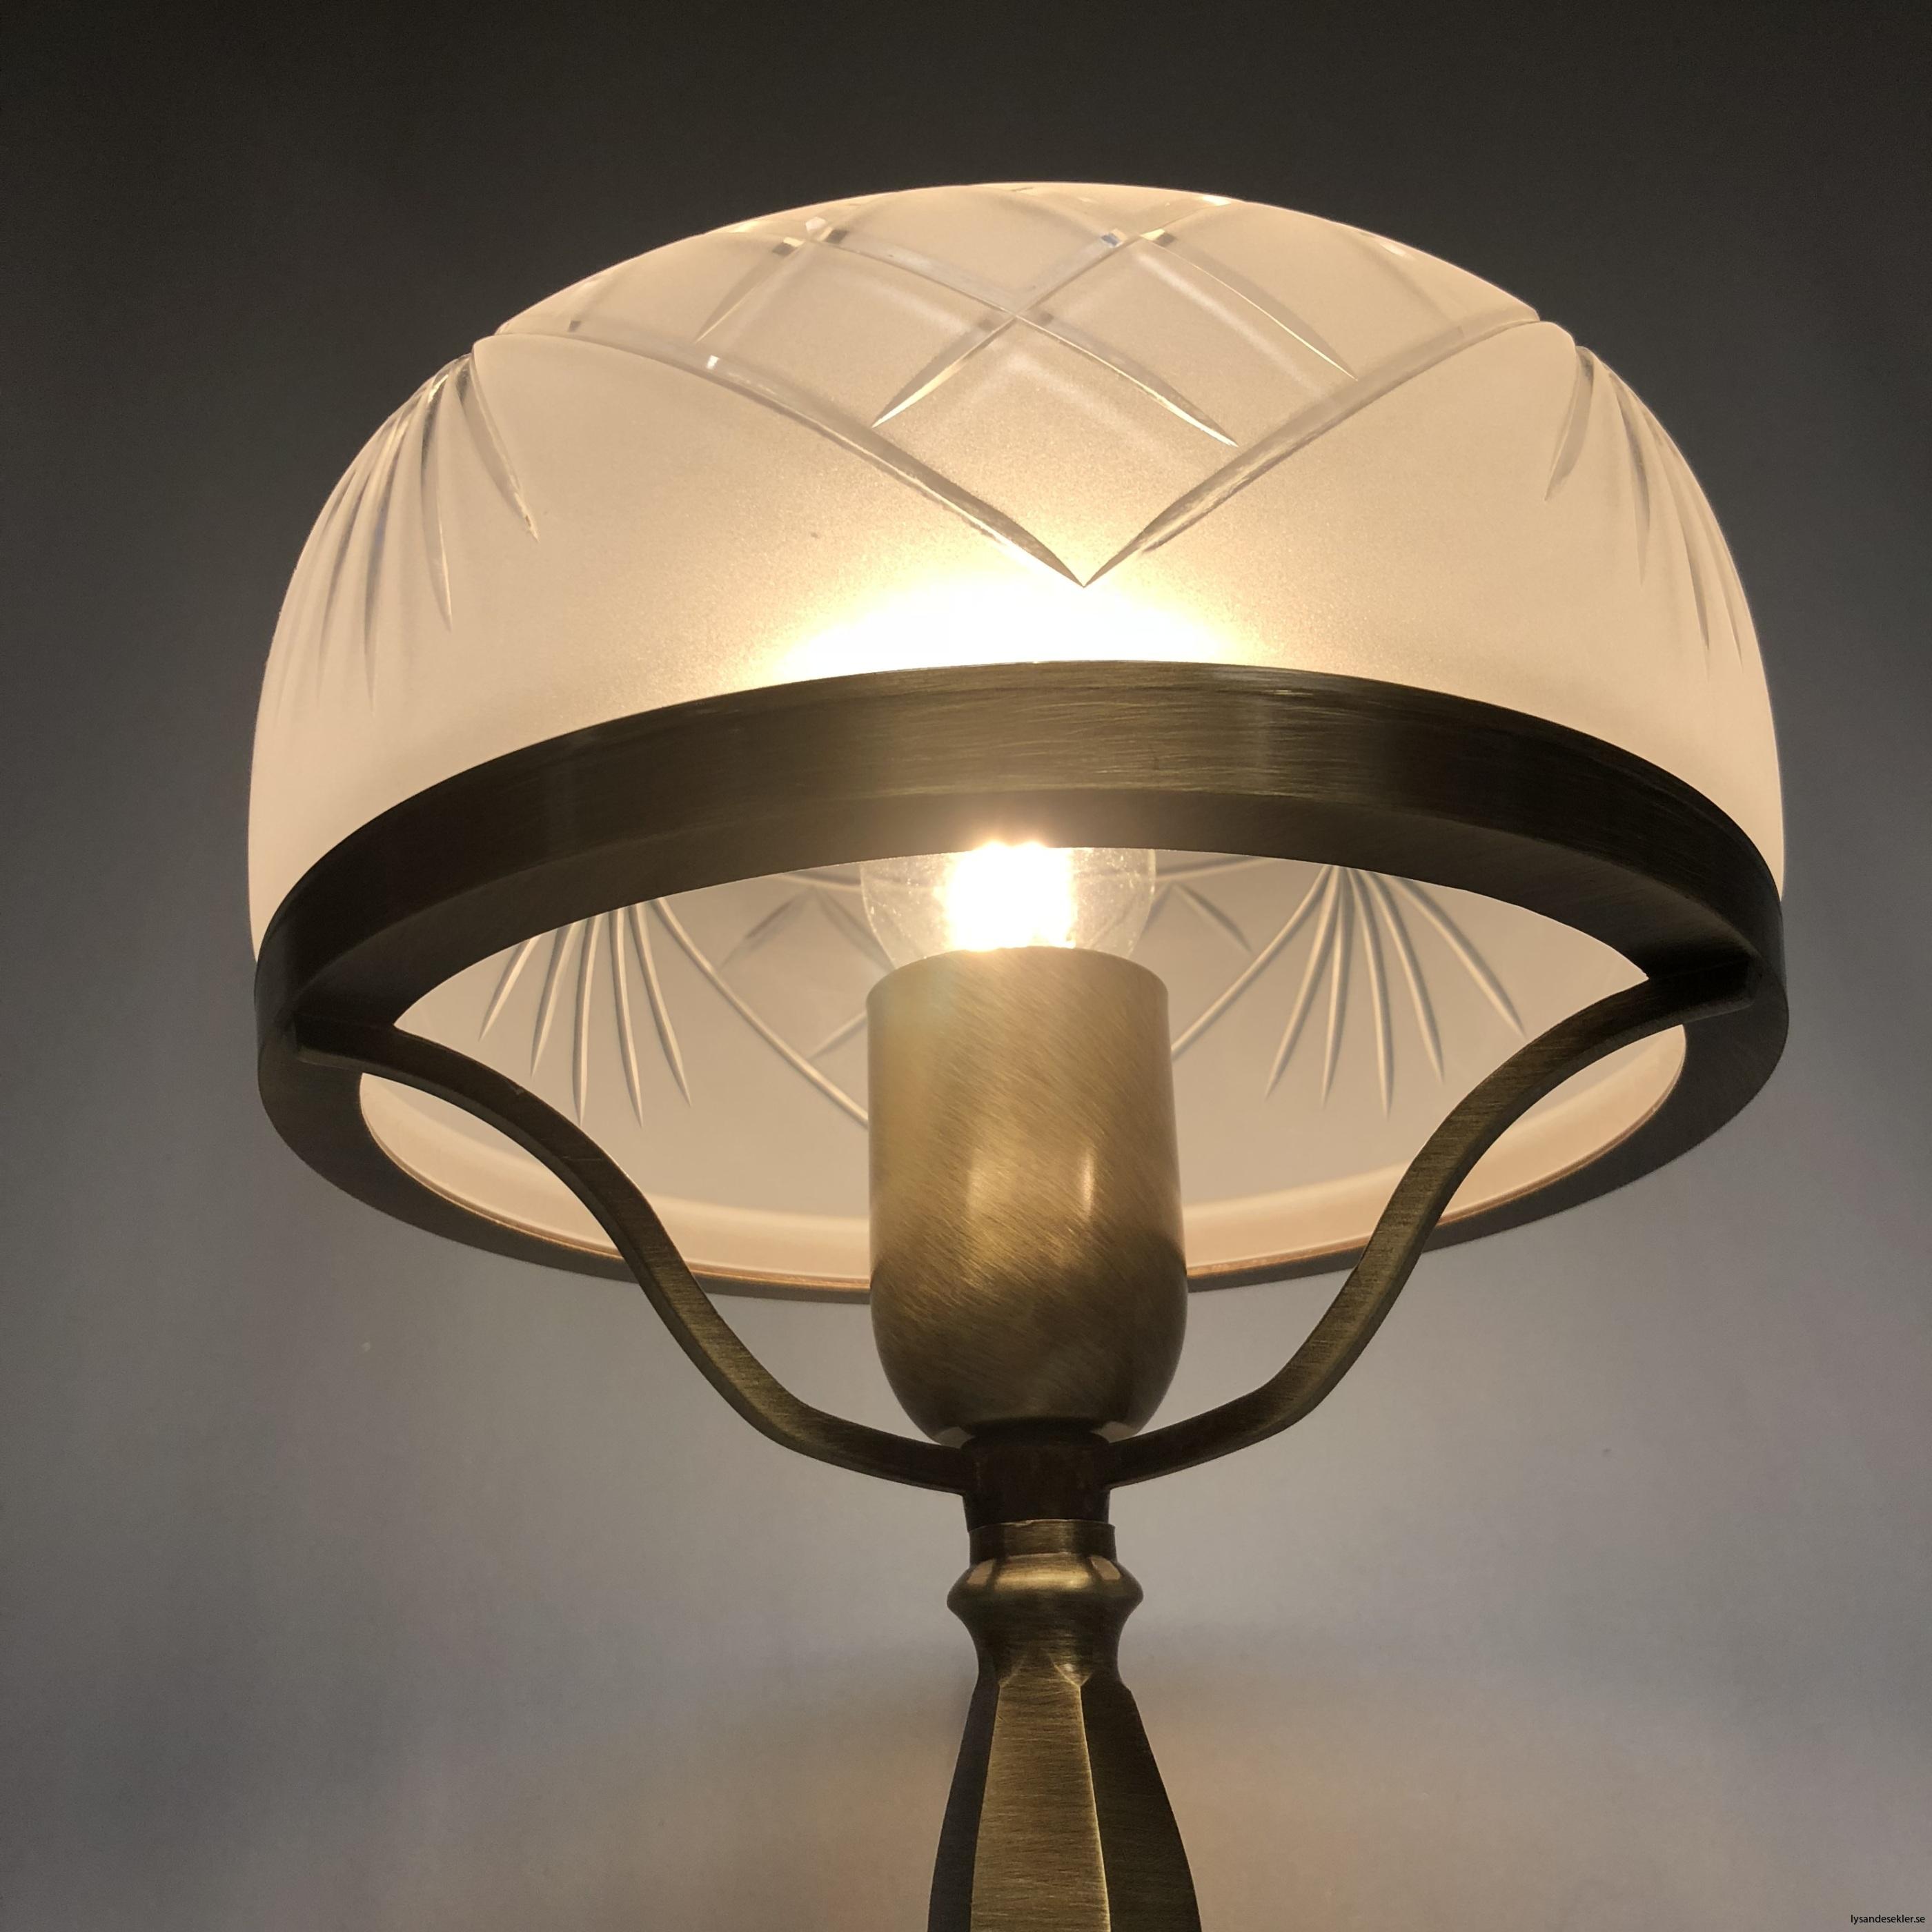 strindbergslampa strindbergslampor strindberg lampa skärm kupa strindbergsskärm strindbergskupa28